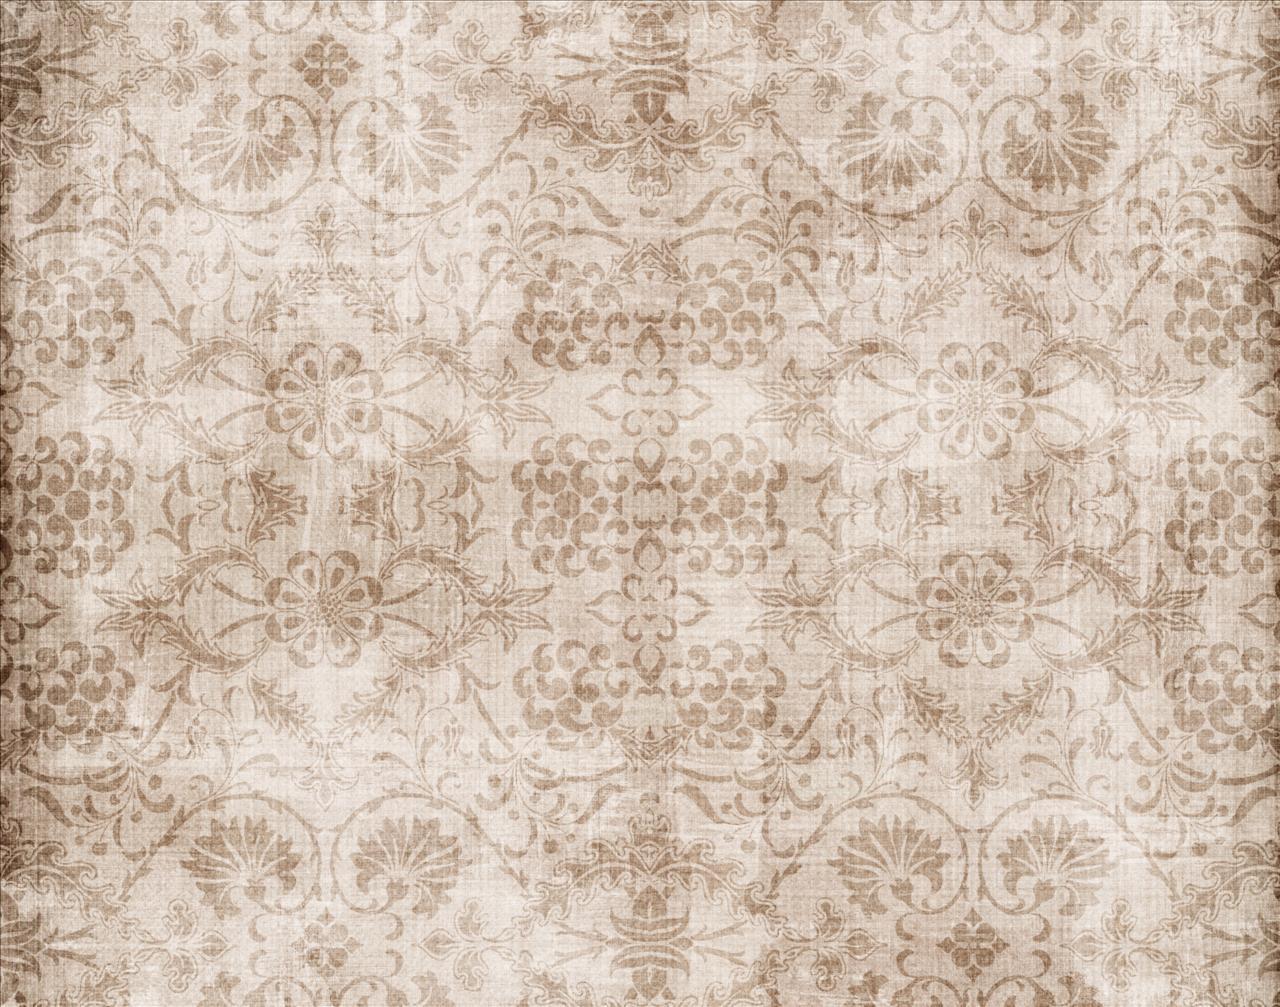 Bohemian Desktop Background Fabric